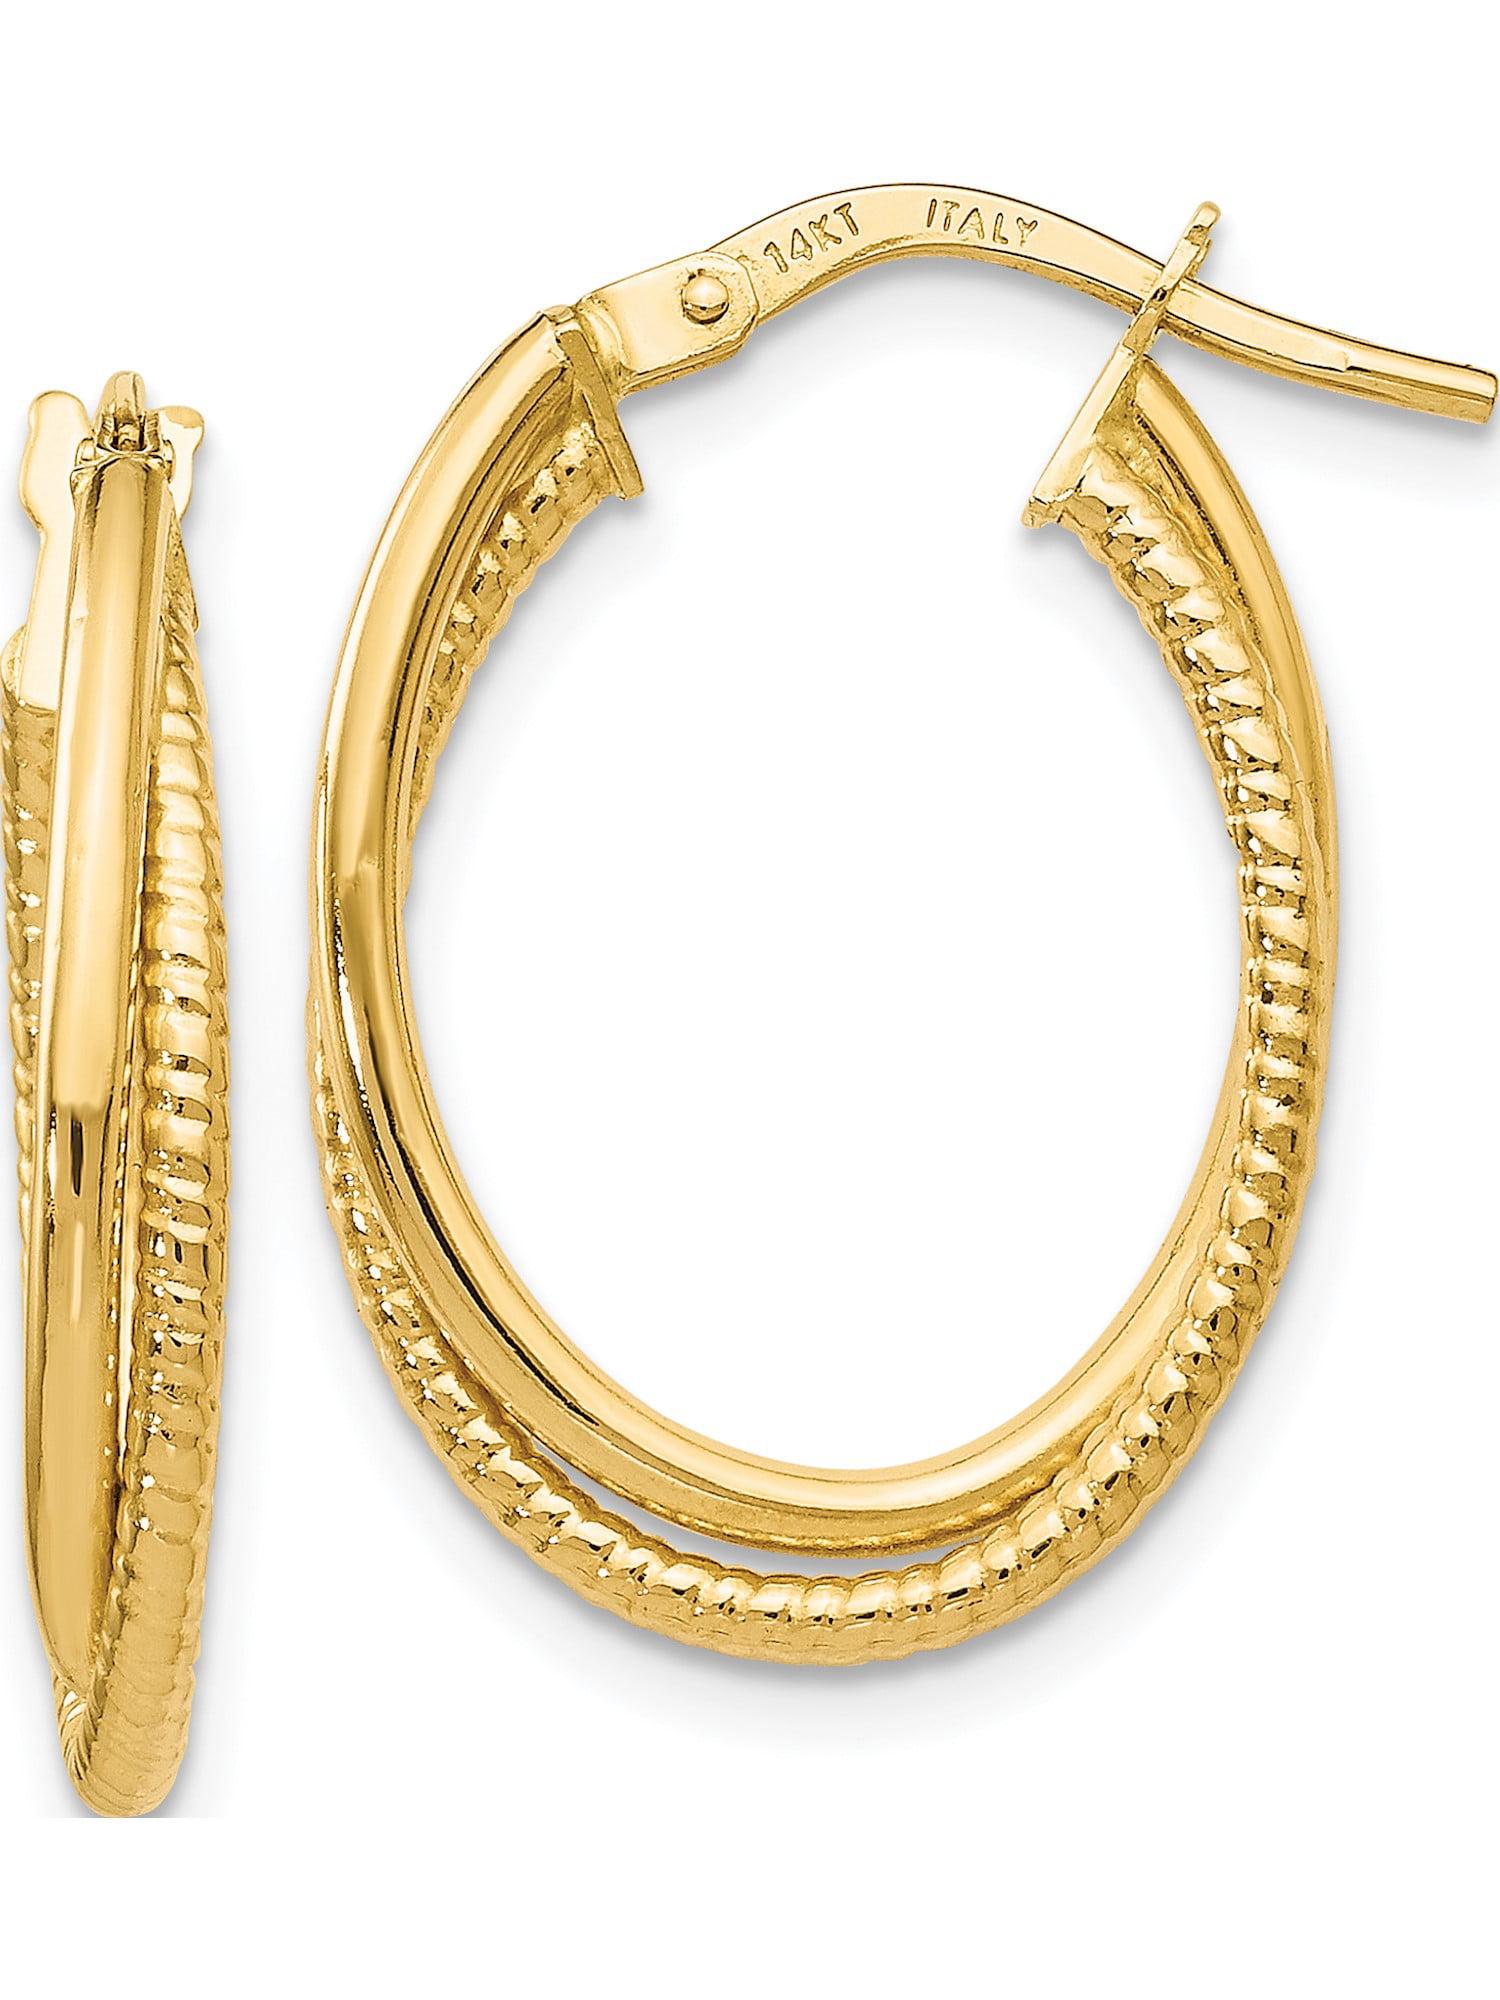 14K Gold 3.5mm Thickness Diamond Cut Hoop Hinged Earrings Ioka